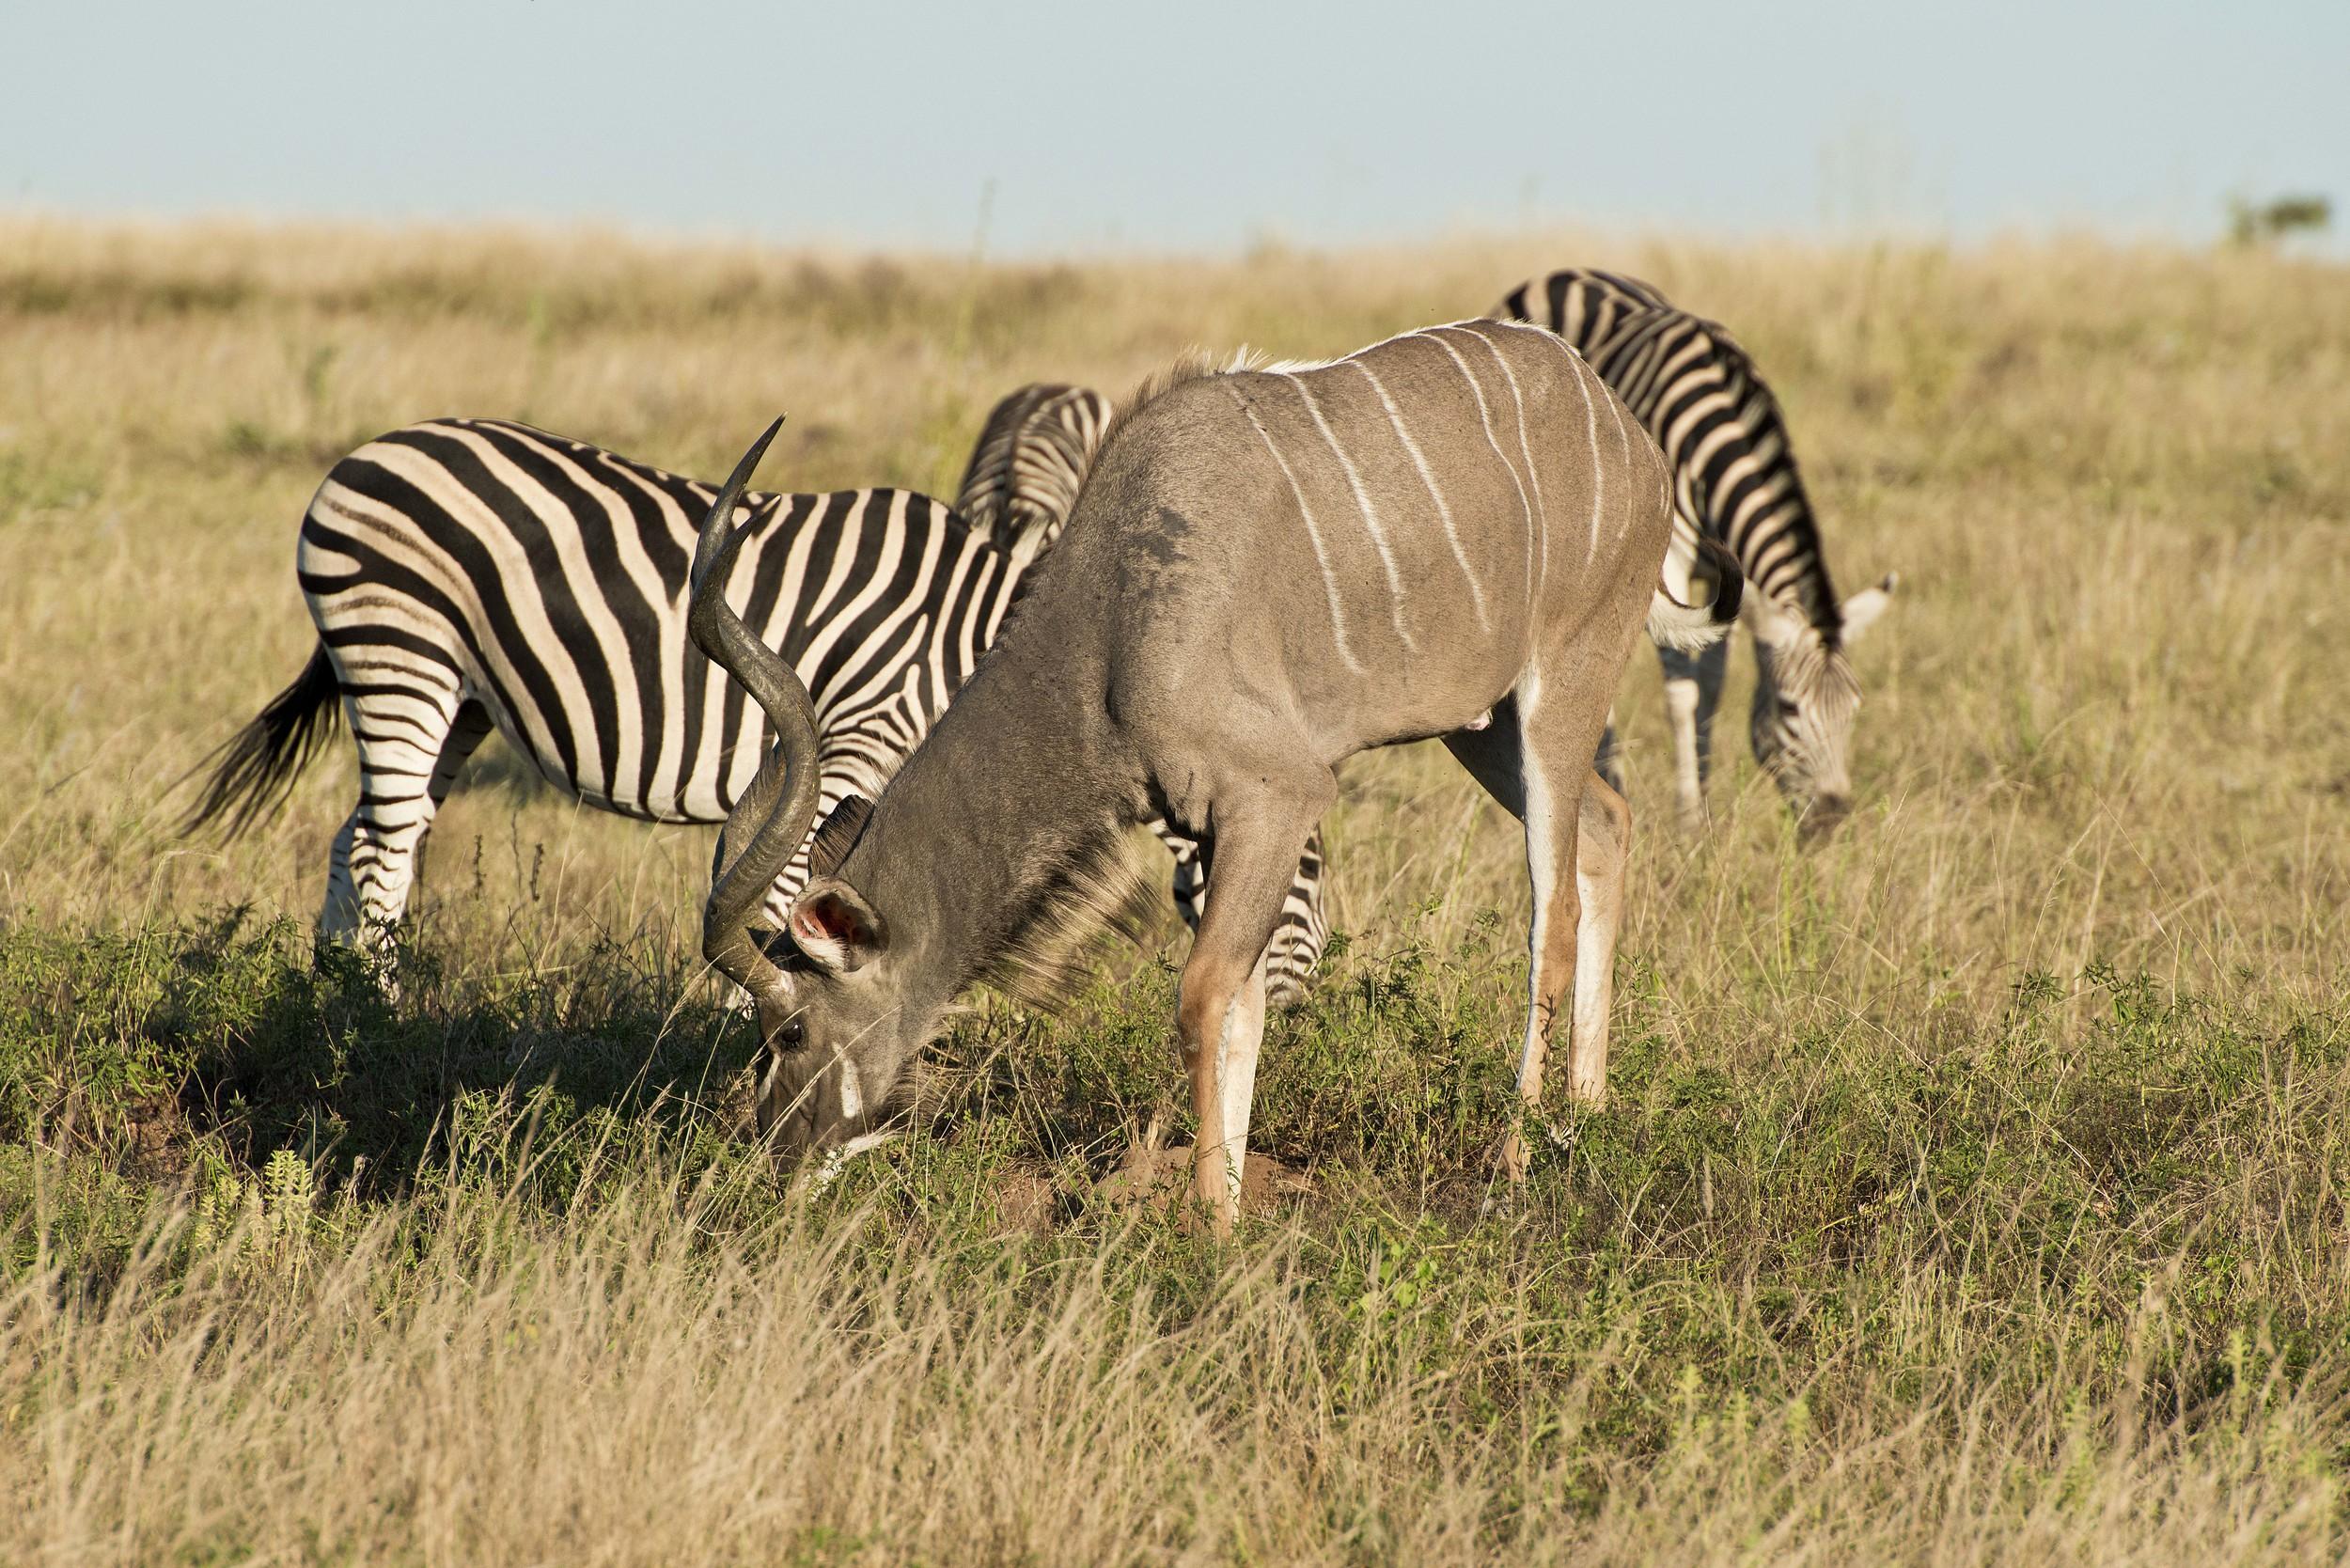 130420_DSC2957 Kudo and Zebra.jpg